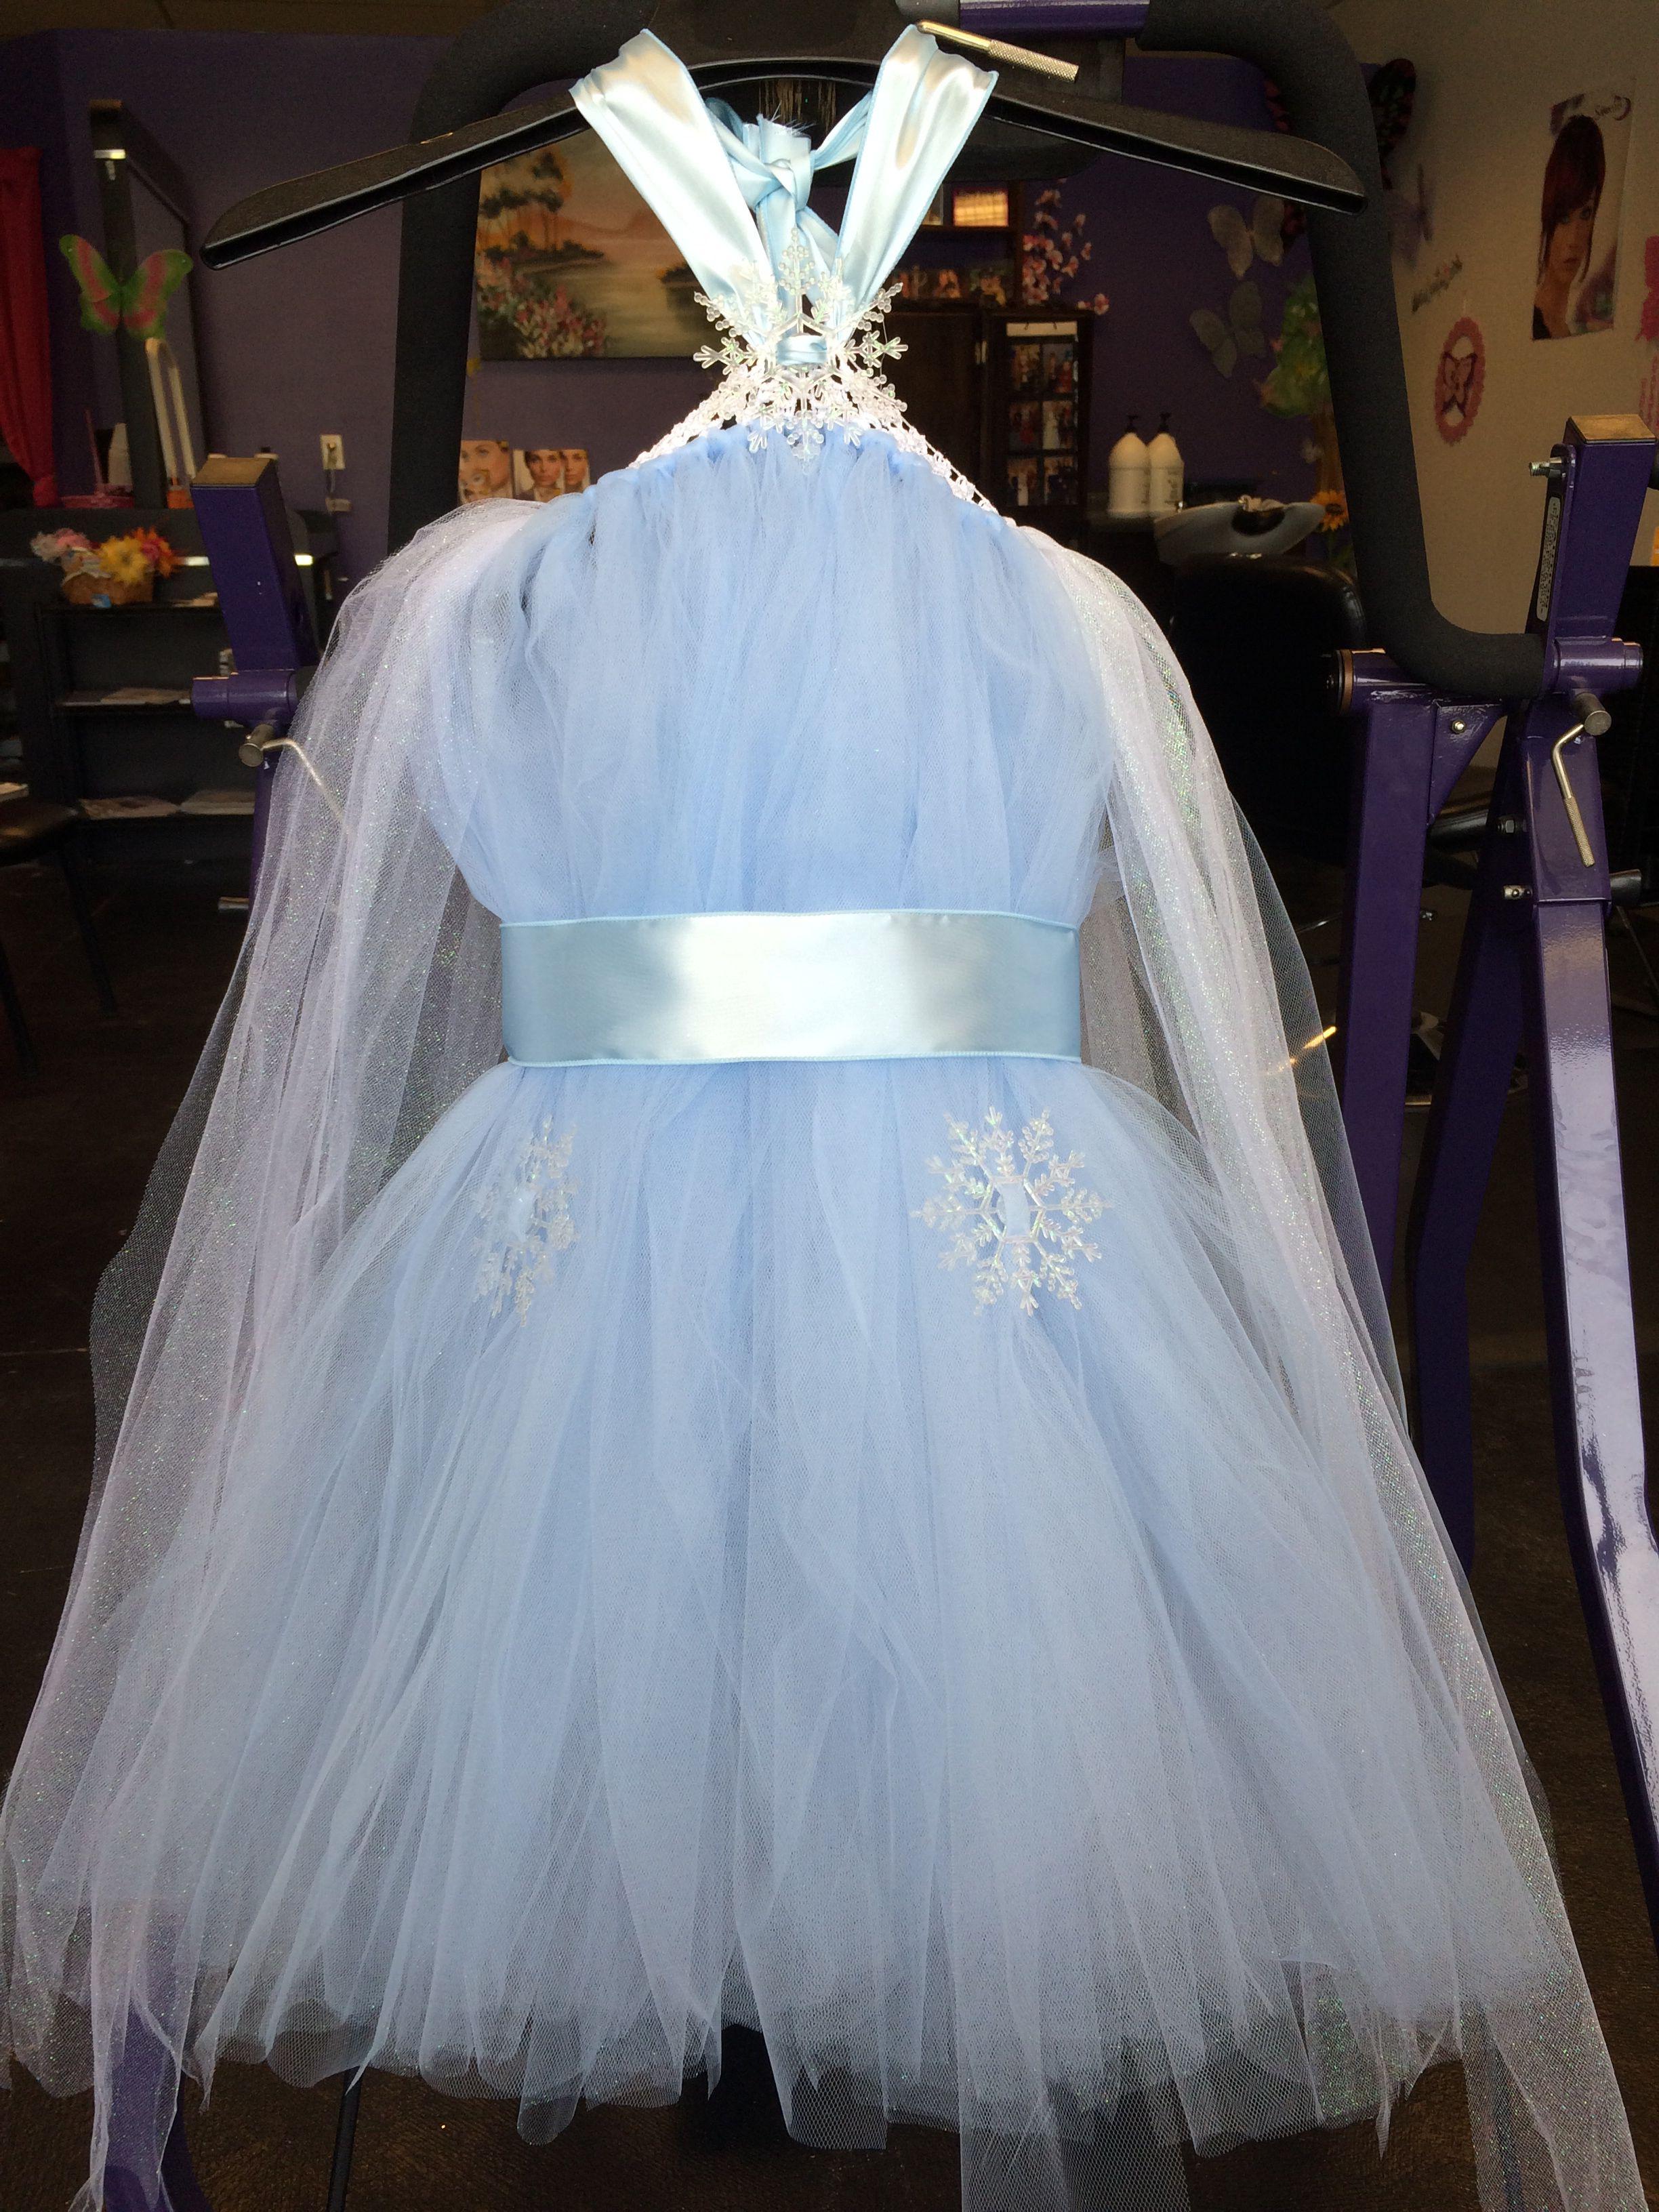 Frozen inspired tutu dress